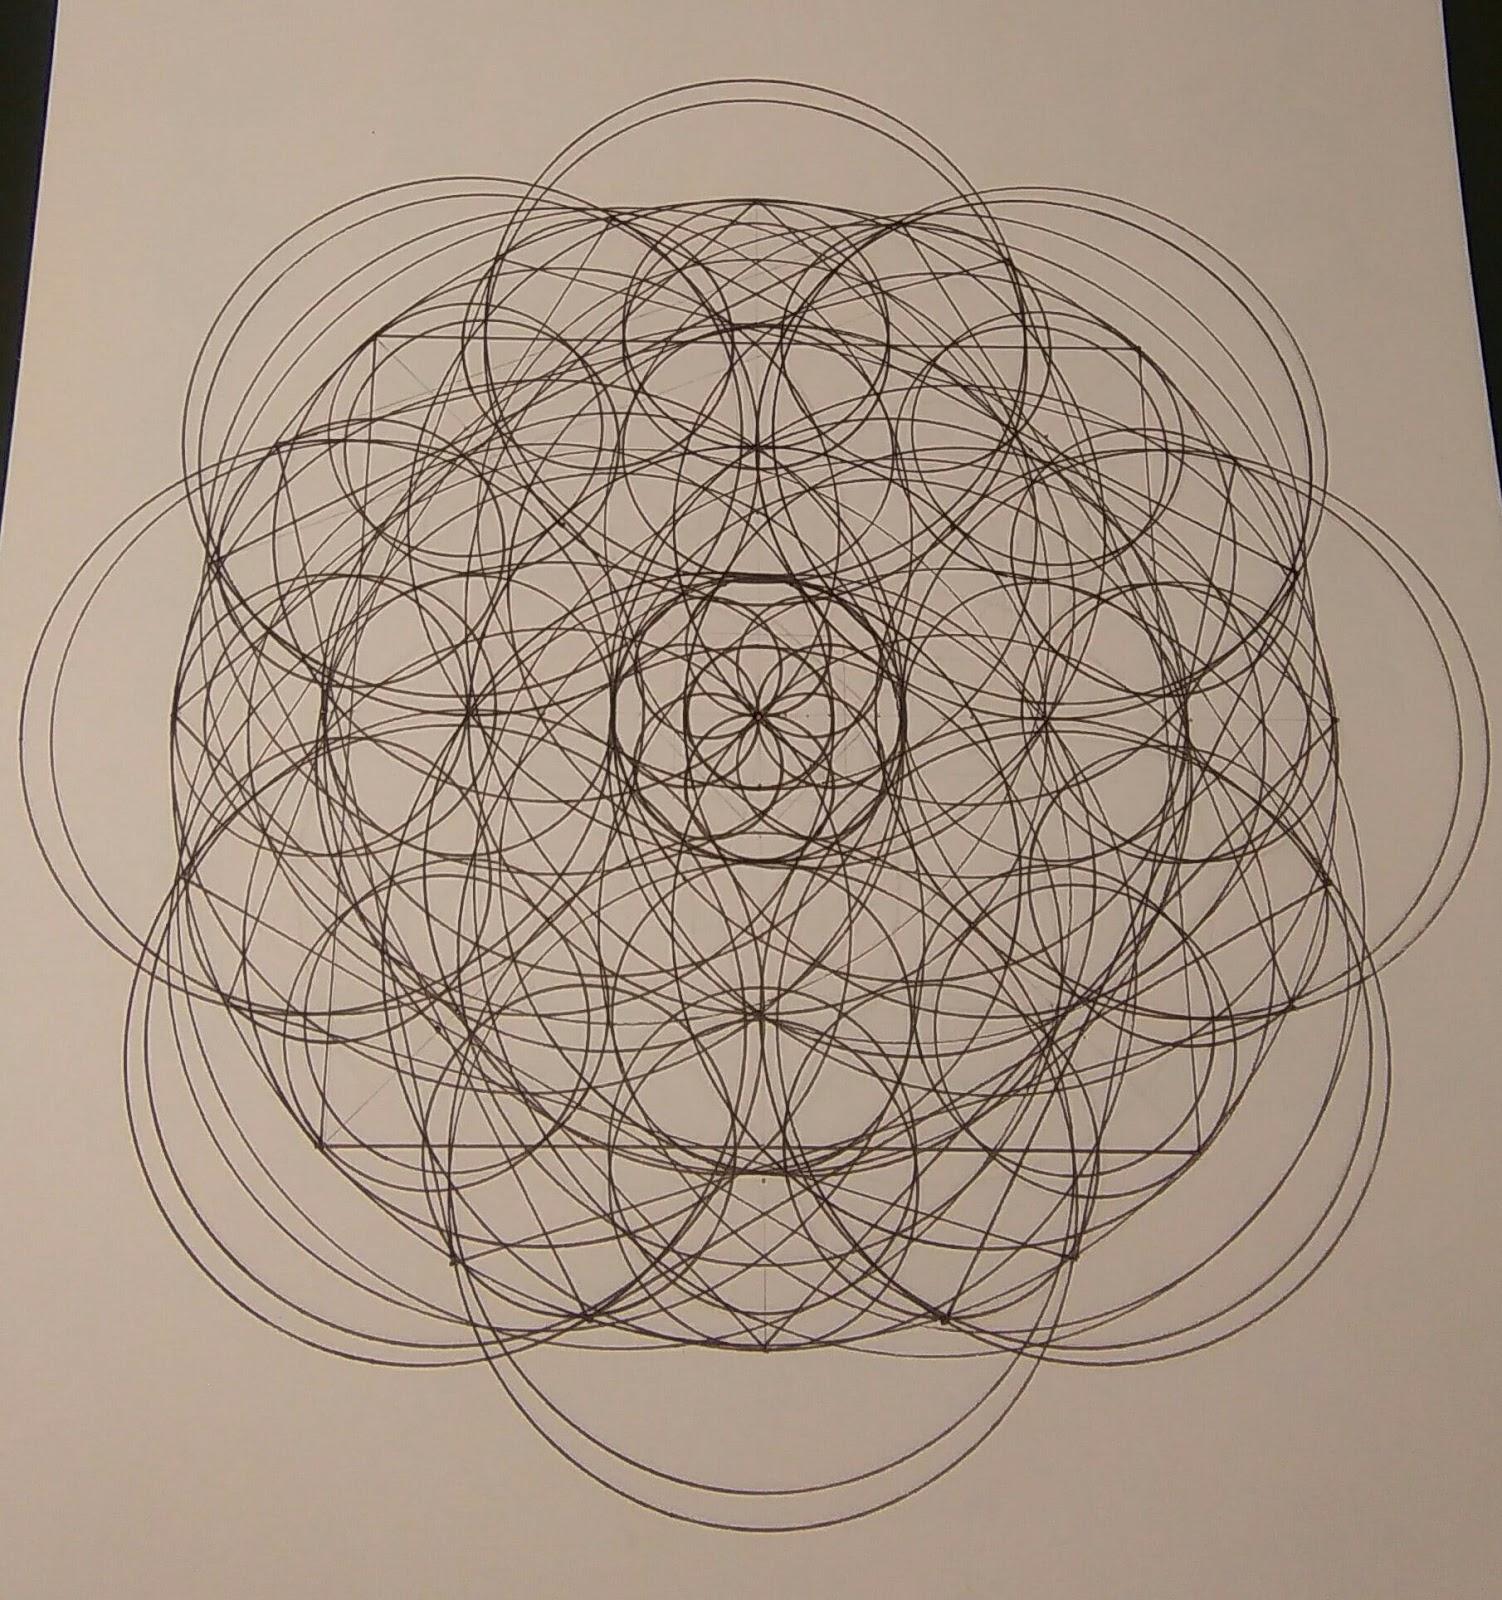 [SPOLYK] - Geometries & sketches - Page 6 47295542_1099554516897898_5235011293496213504_o